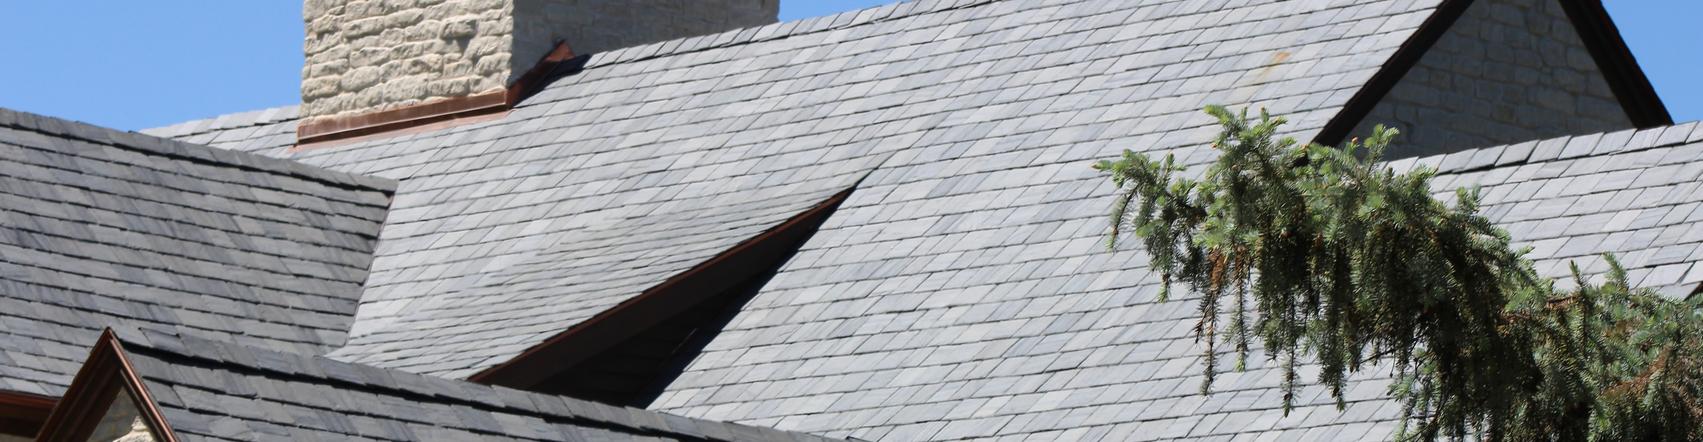 SlateTec Lightweight slate roof system. Genuine sla